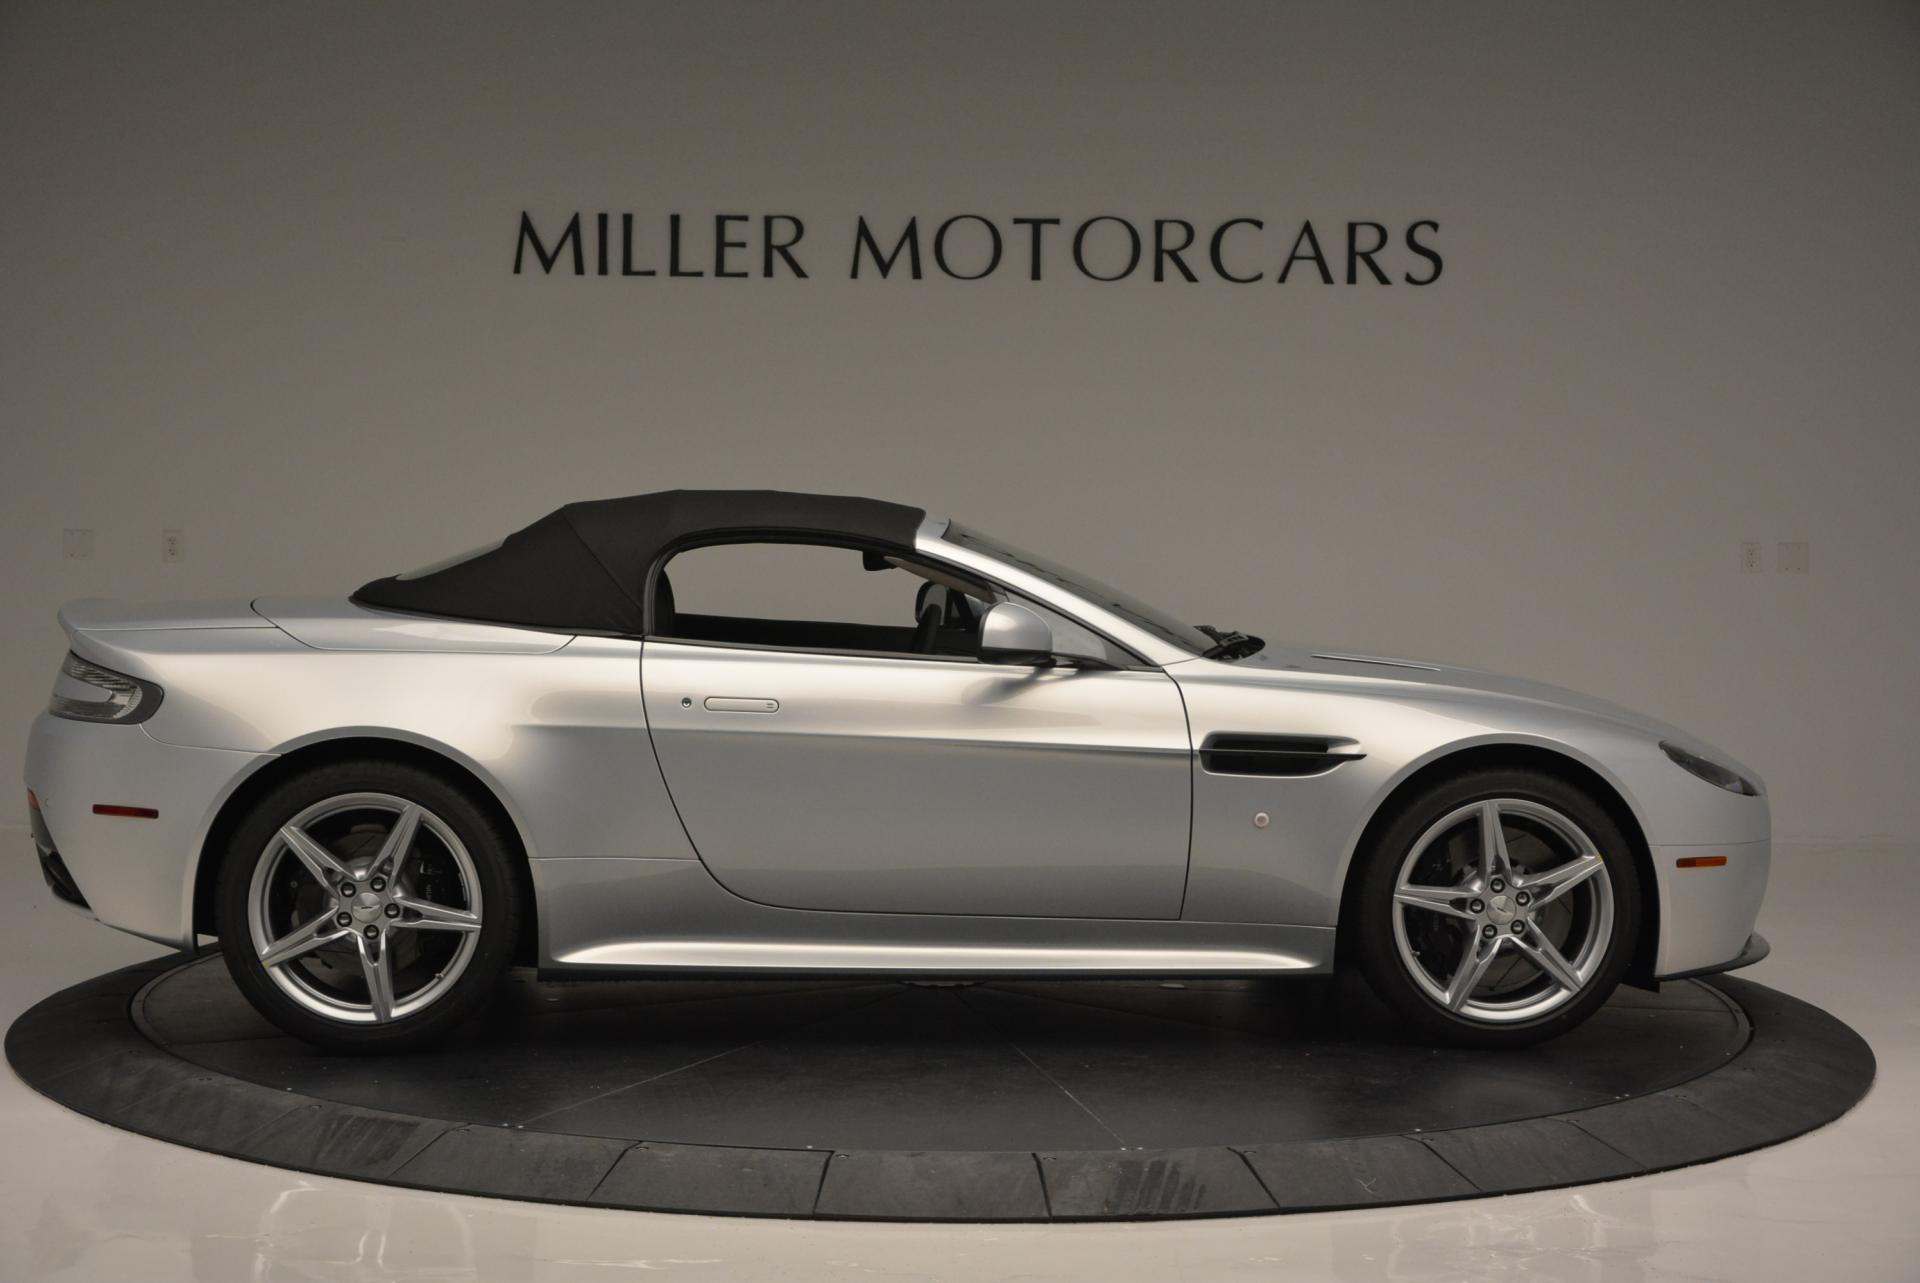 New 2016 Aston Martin V8 Vantage GTS Roadster For Sale In Westport, CT 90_p19